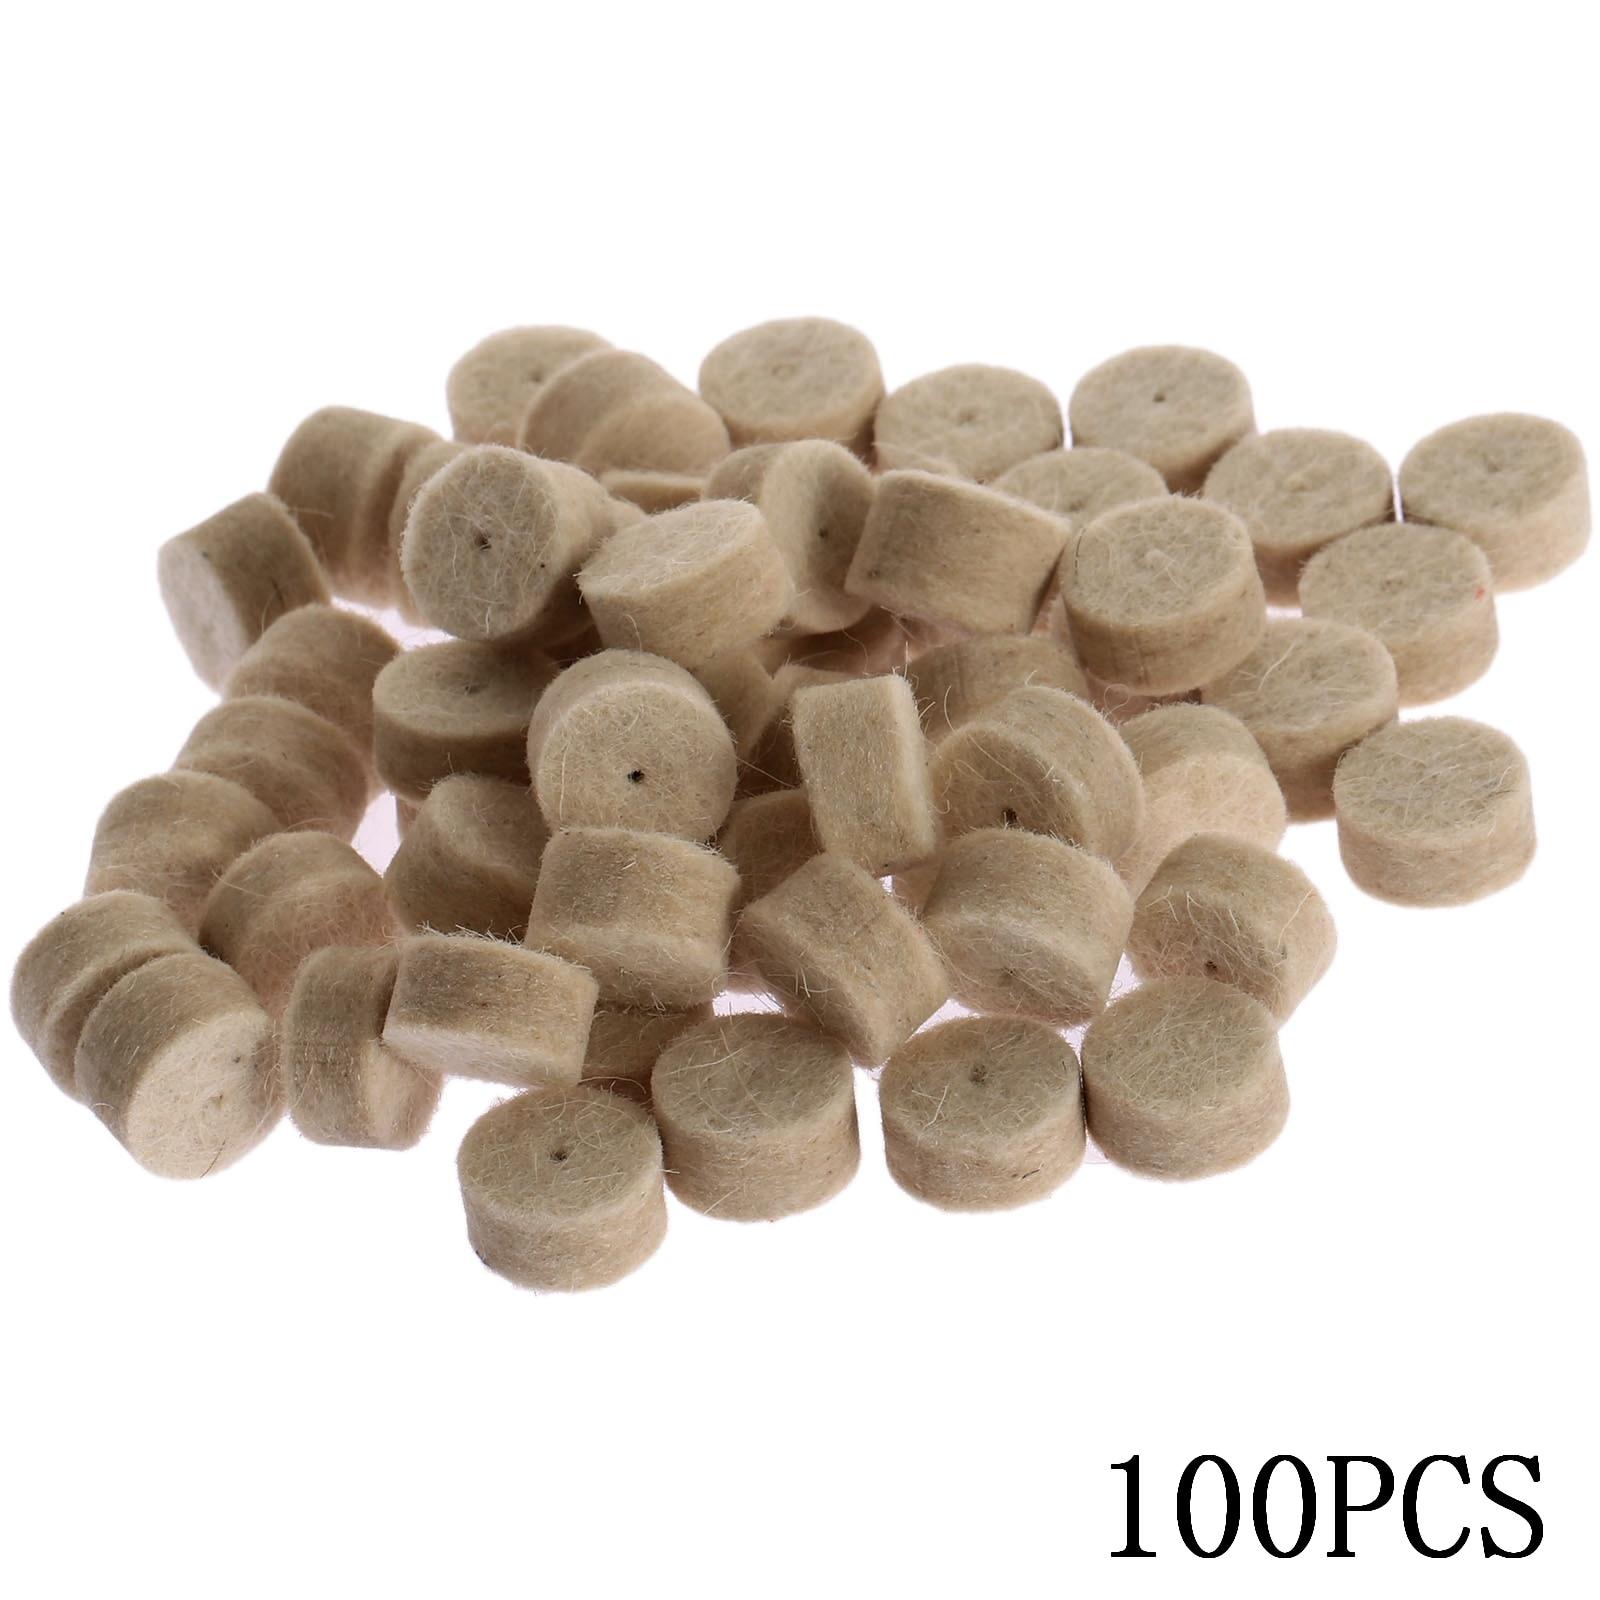 100 pezzi Dremel accessori 13 mm lana feltro lucidatura lucidatura - Utensili elettrici - Fotografia 3